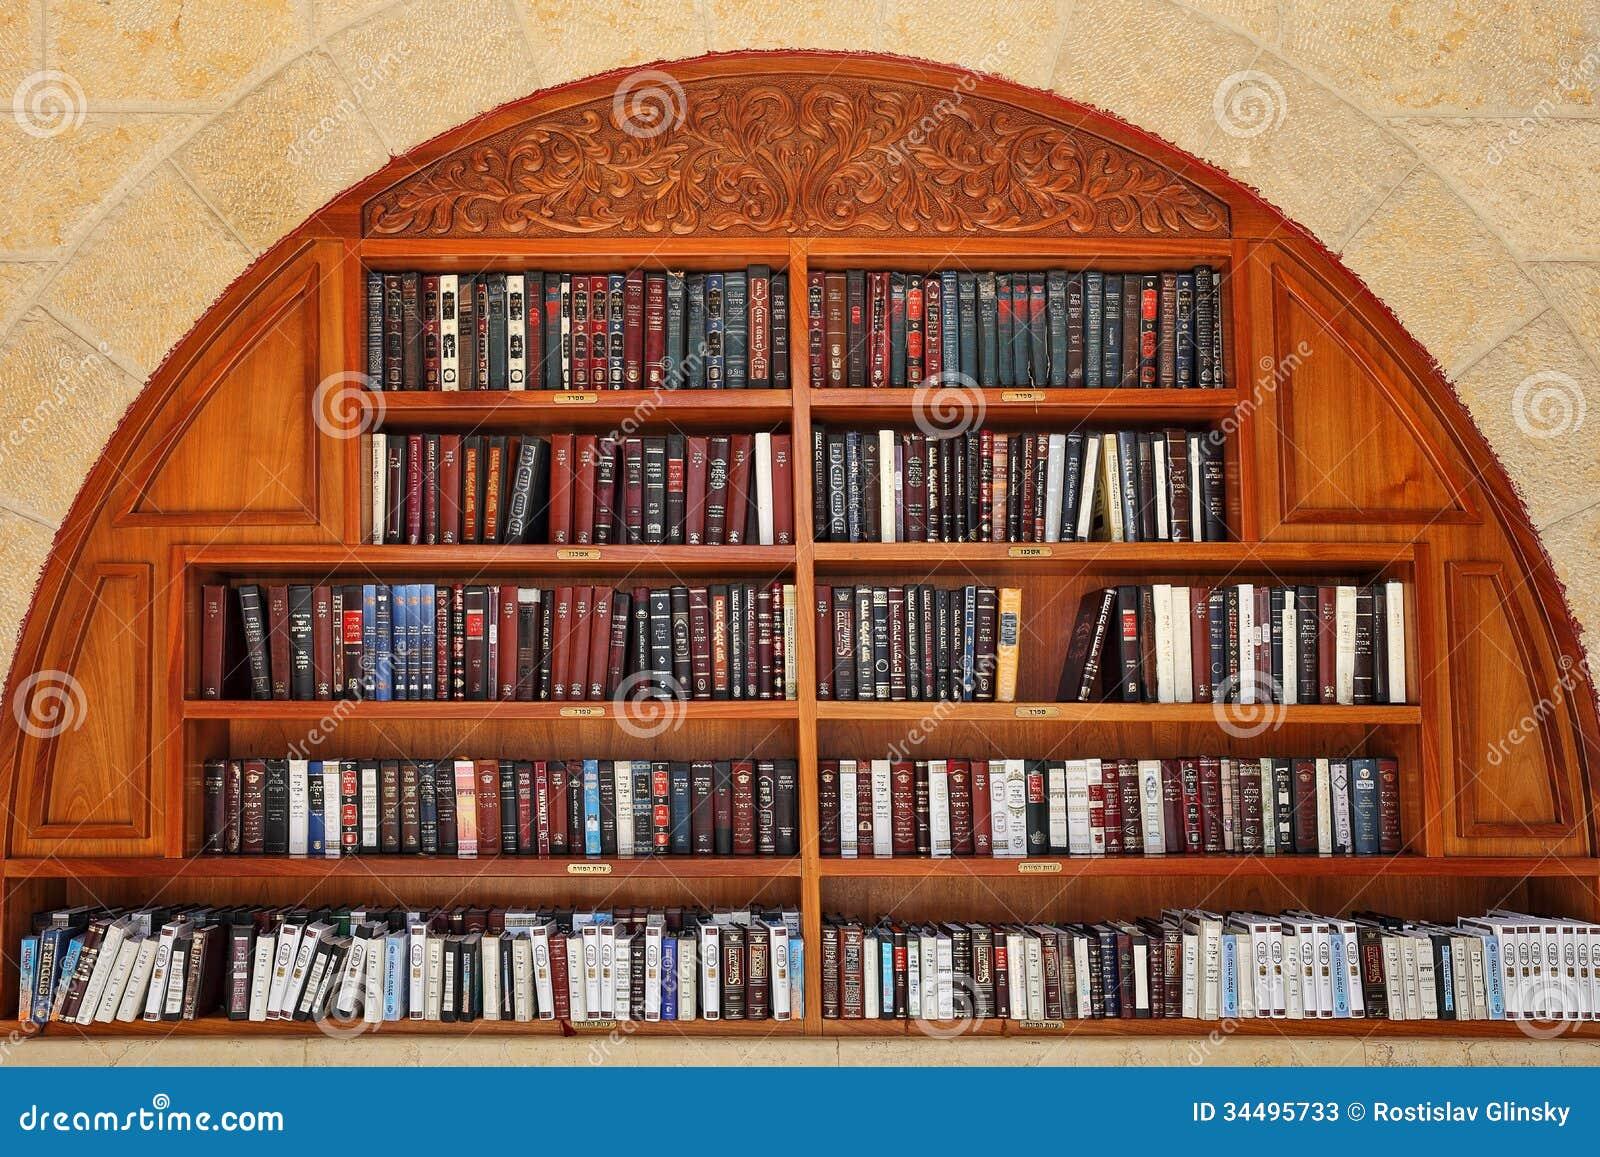 jewish library stock photos - photo #16